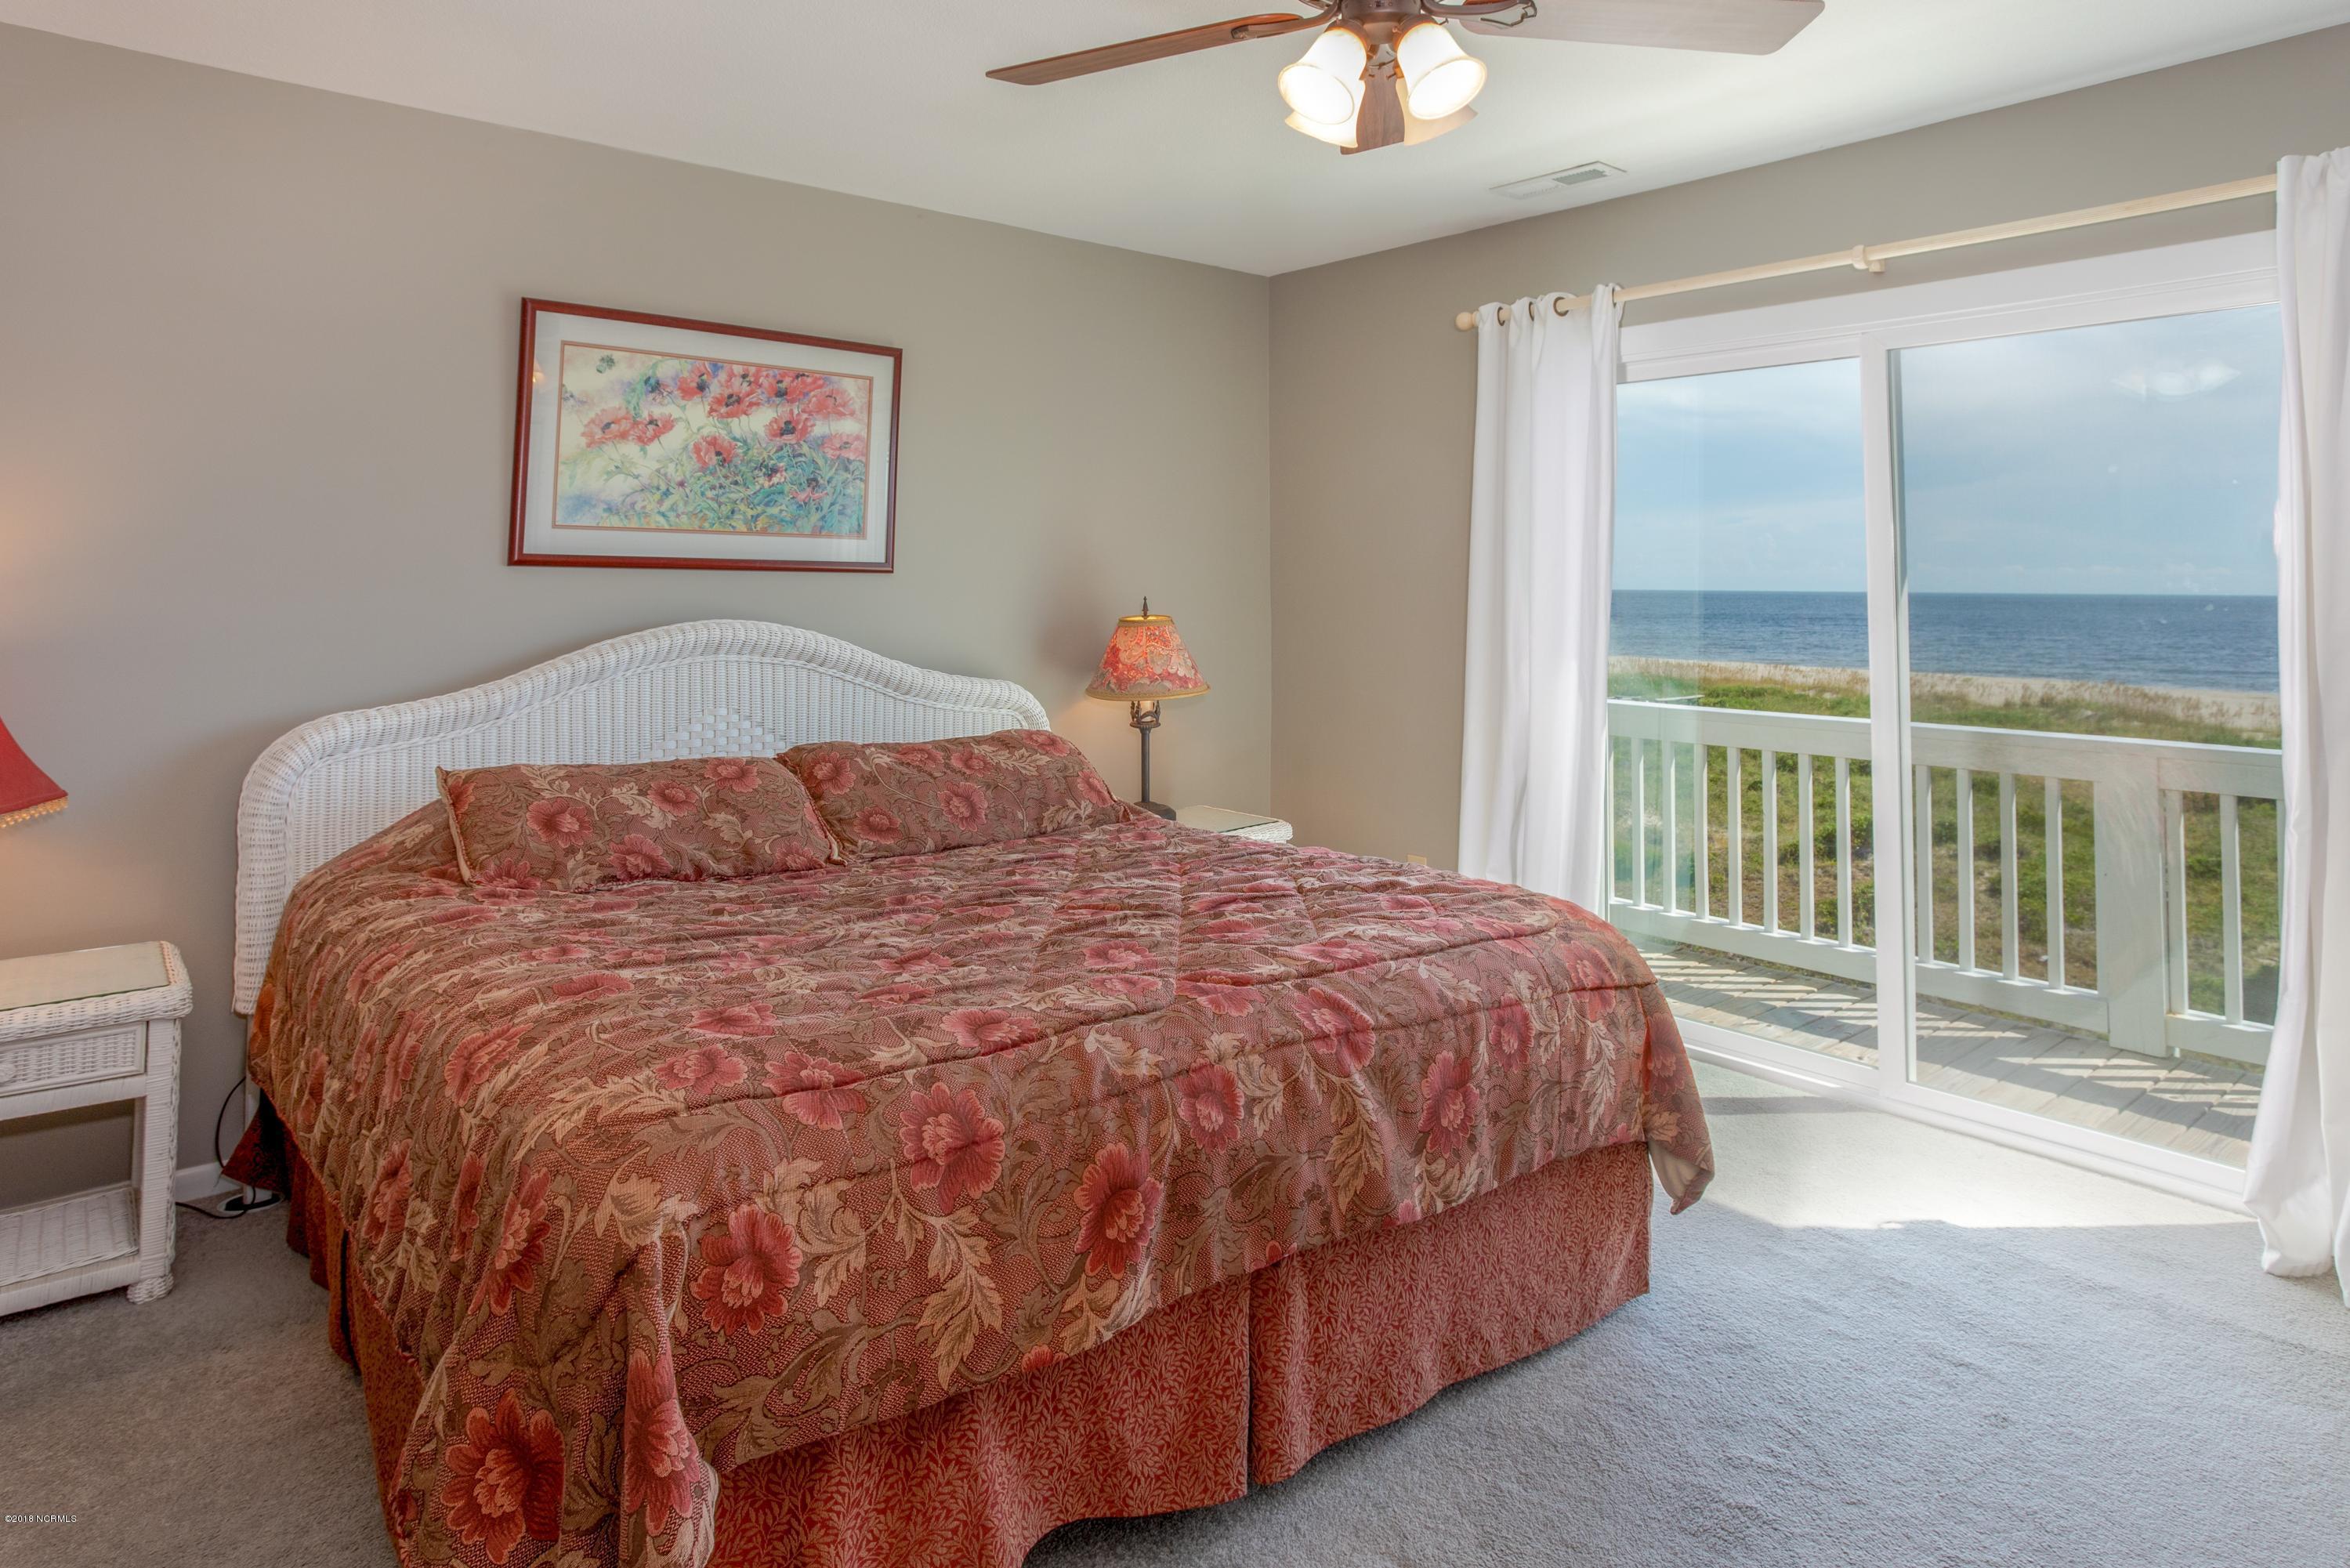 623 Caswell Beach Road Caswell Beach, NC 28465